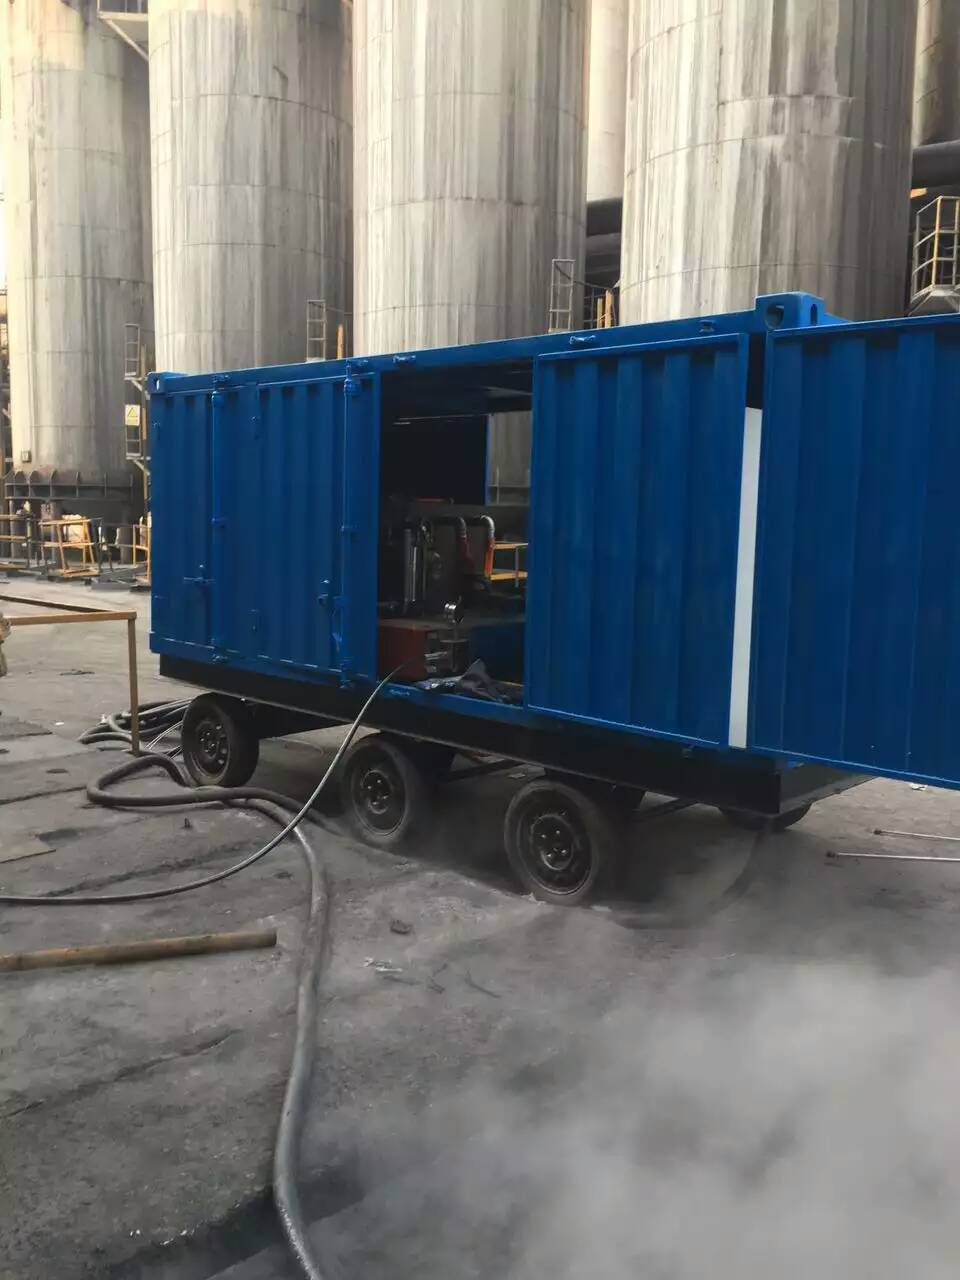 500 Bar Sewage Drain Cleaning Equipment High Pressure Cleaner